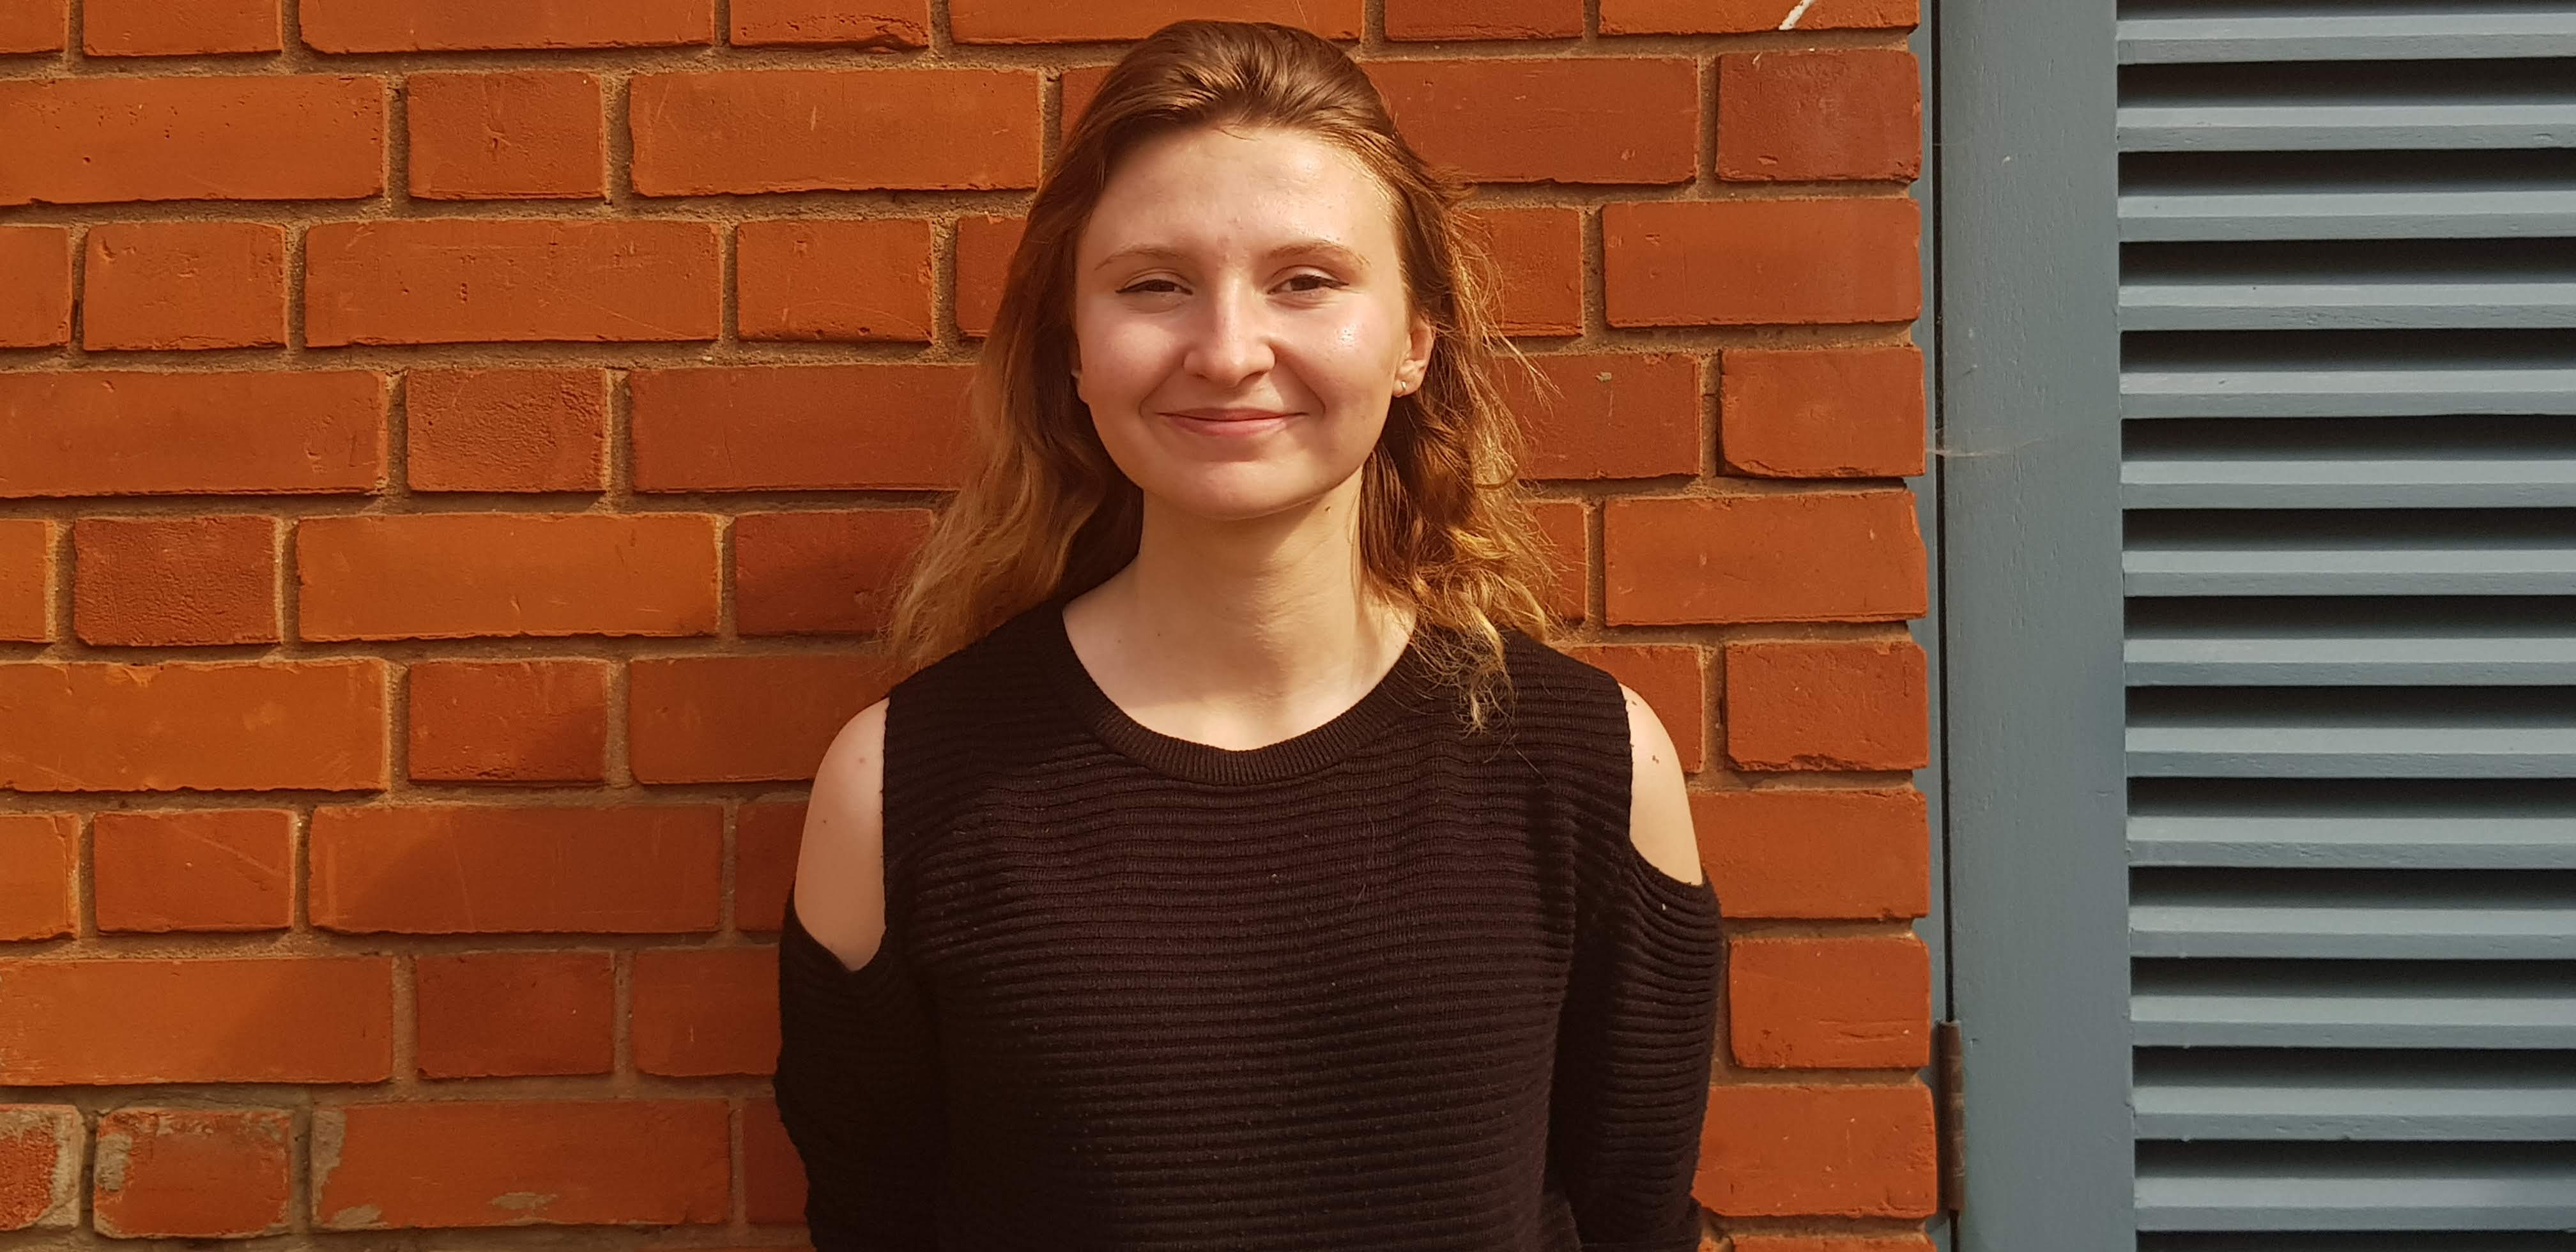 Laura Maechling